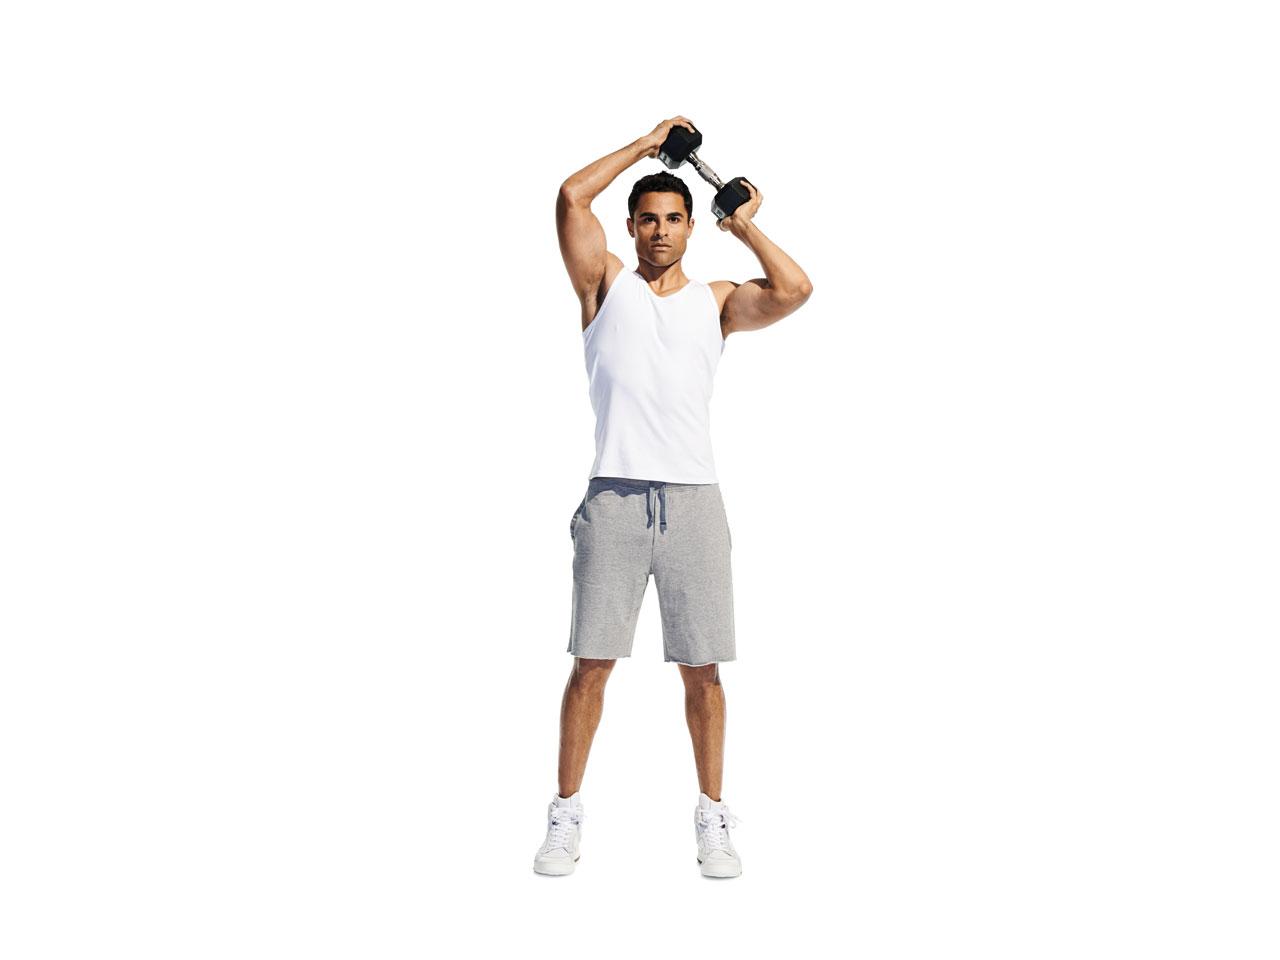 Man doing a shoulder halo workout